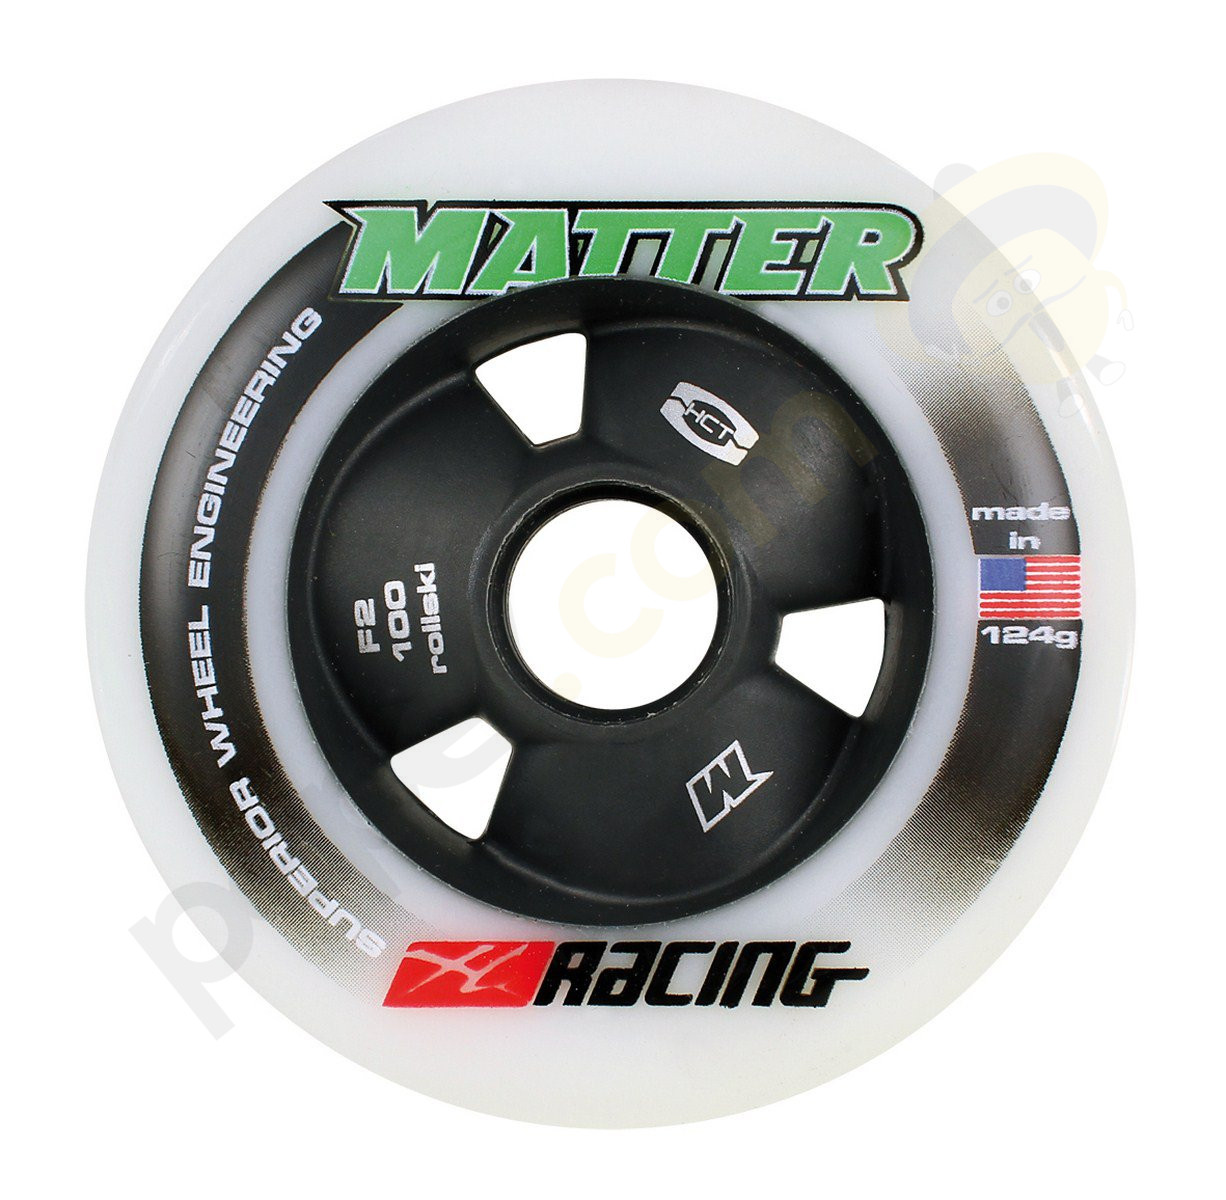 Powerslide Pc Game: Powerslide Nordic Matter XC Racing Wheel 20500 (4 Pcs